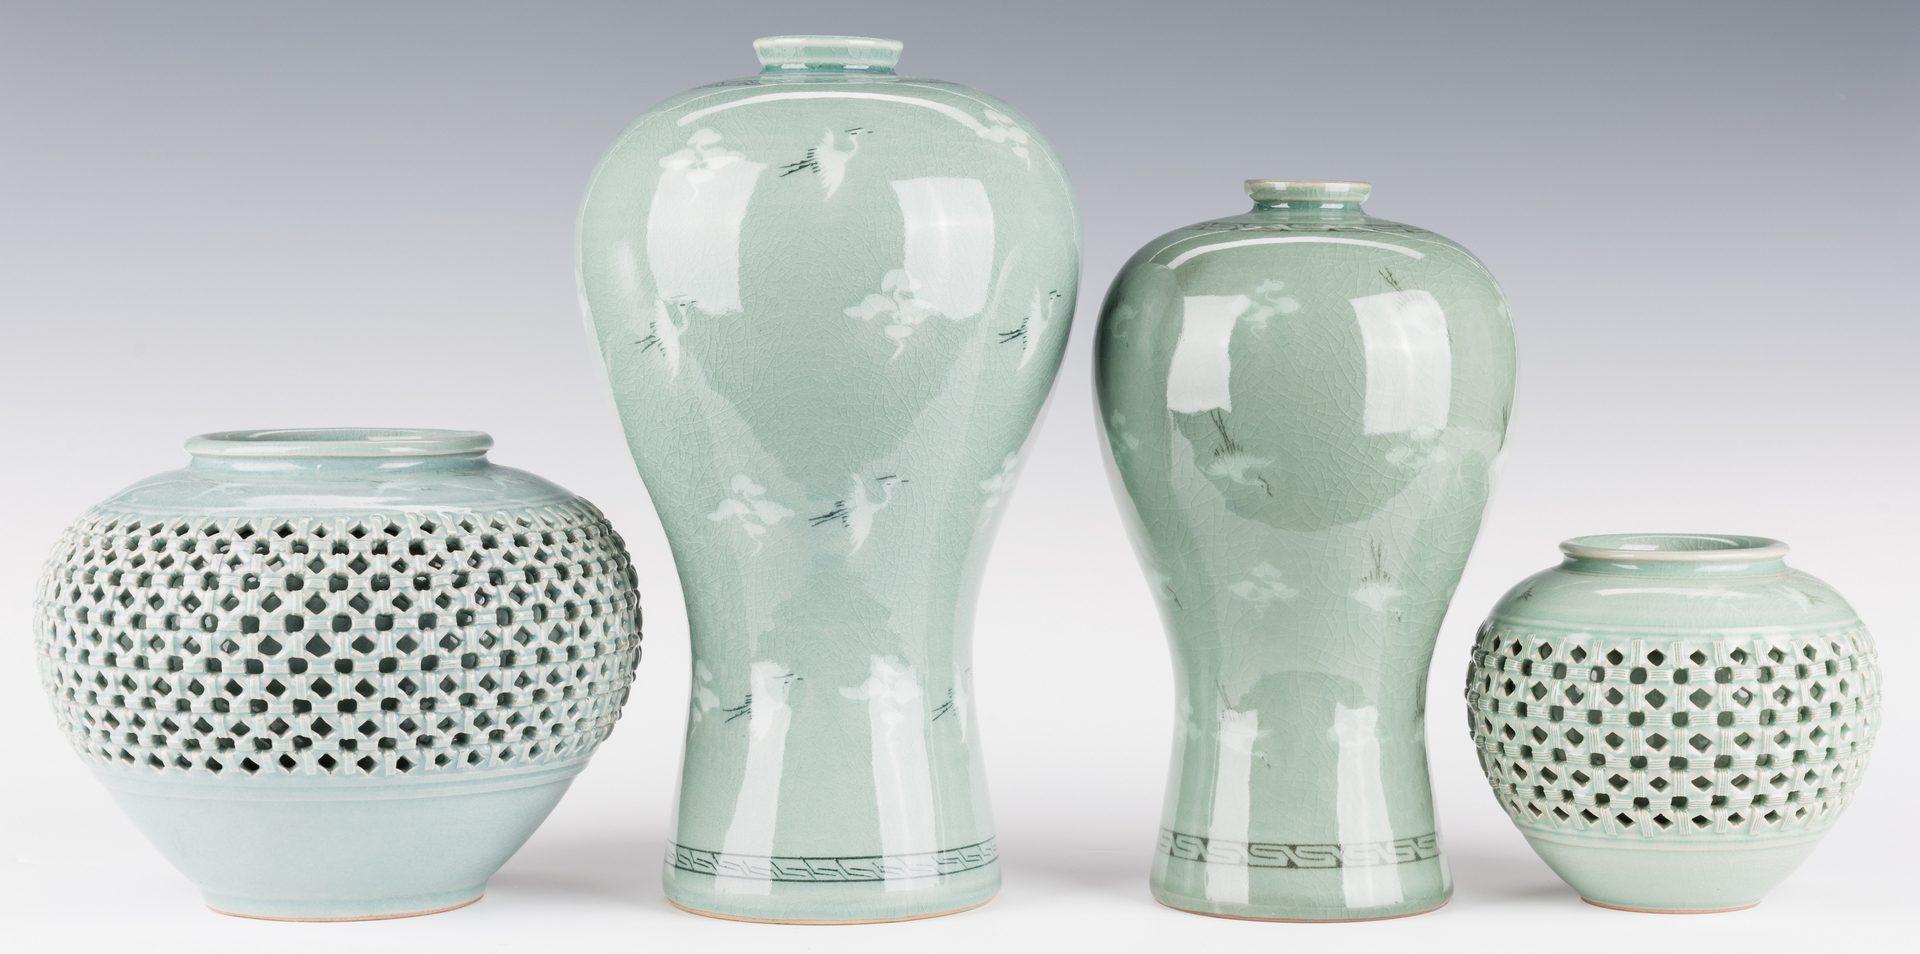 Lot 185: 4 Korean Porcelain Celadon Inlaid Vases